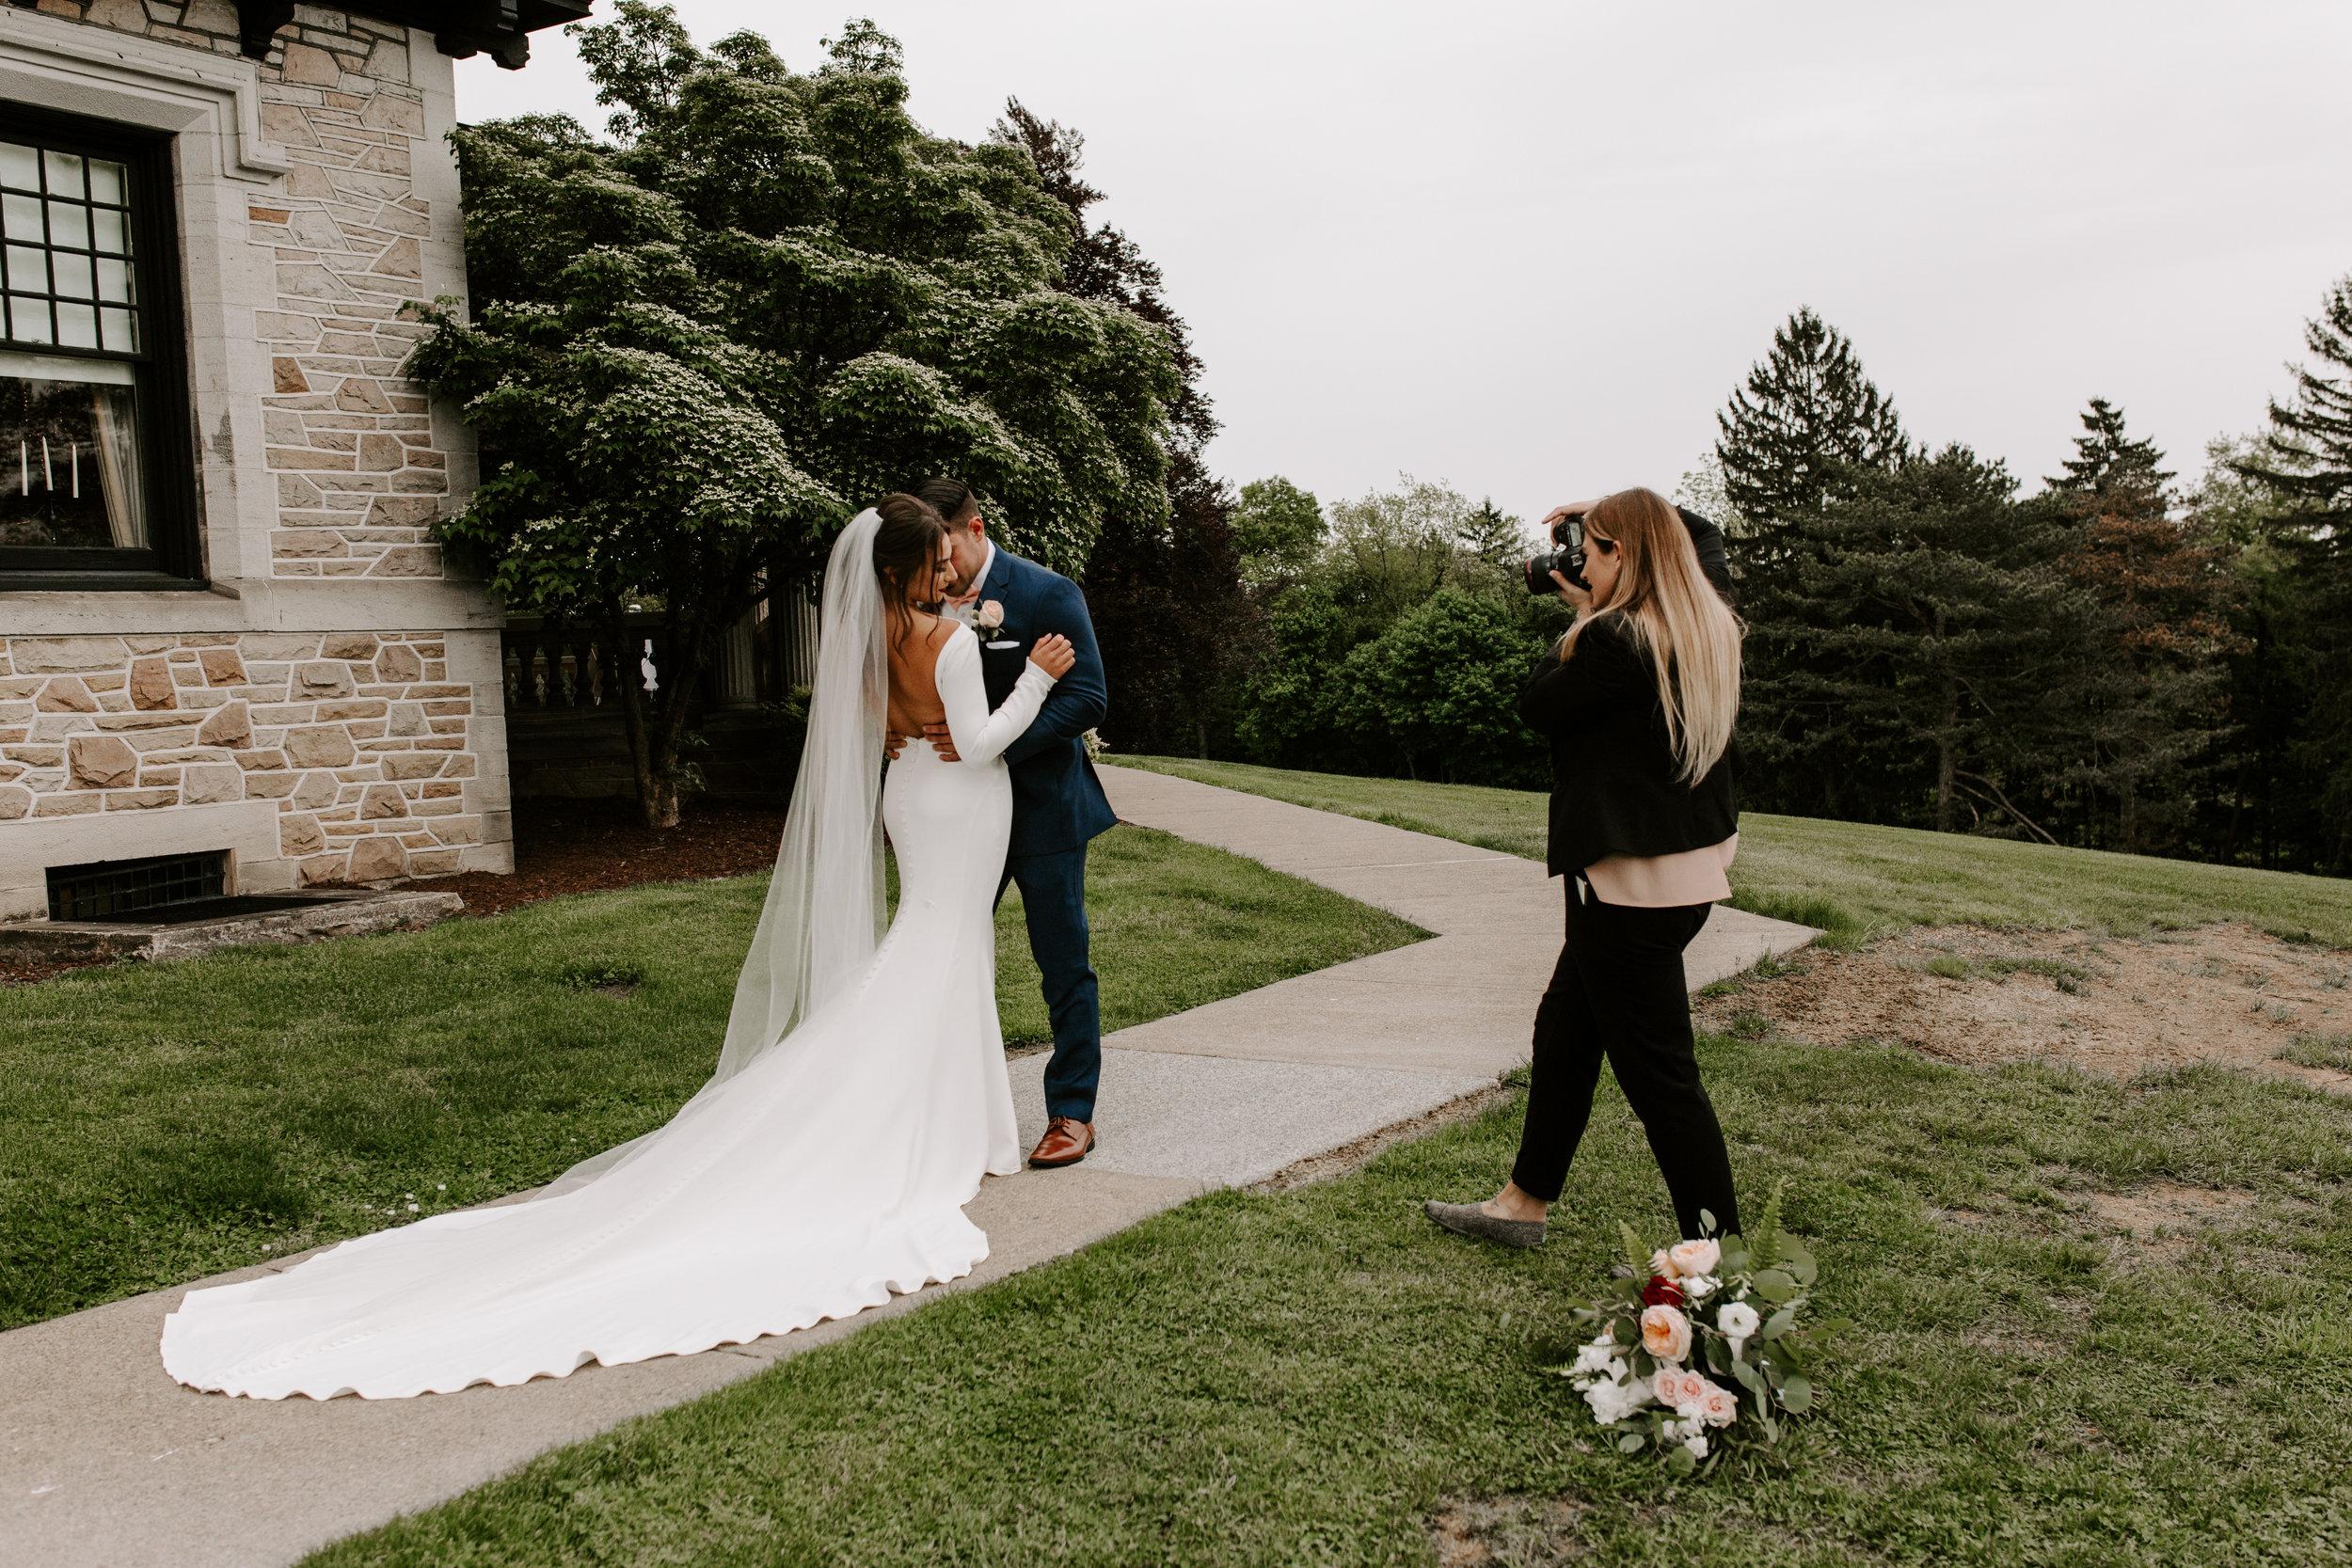 ashley-sara-photography_pittsburgh-photographer-destination-photographer-linden-hall-dawson-pa-nicole-alex-wedding-firstlook (72 of 100).jpg